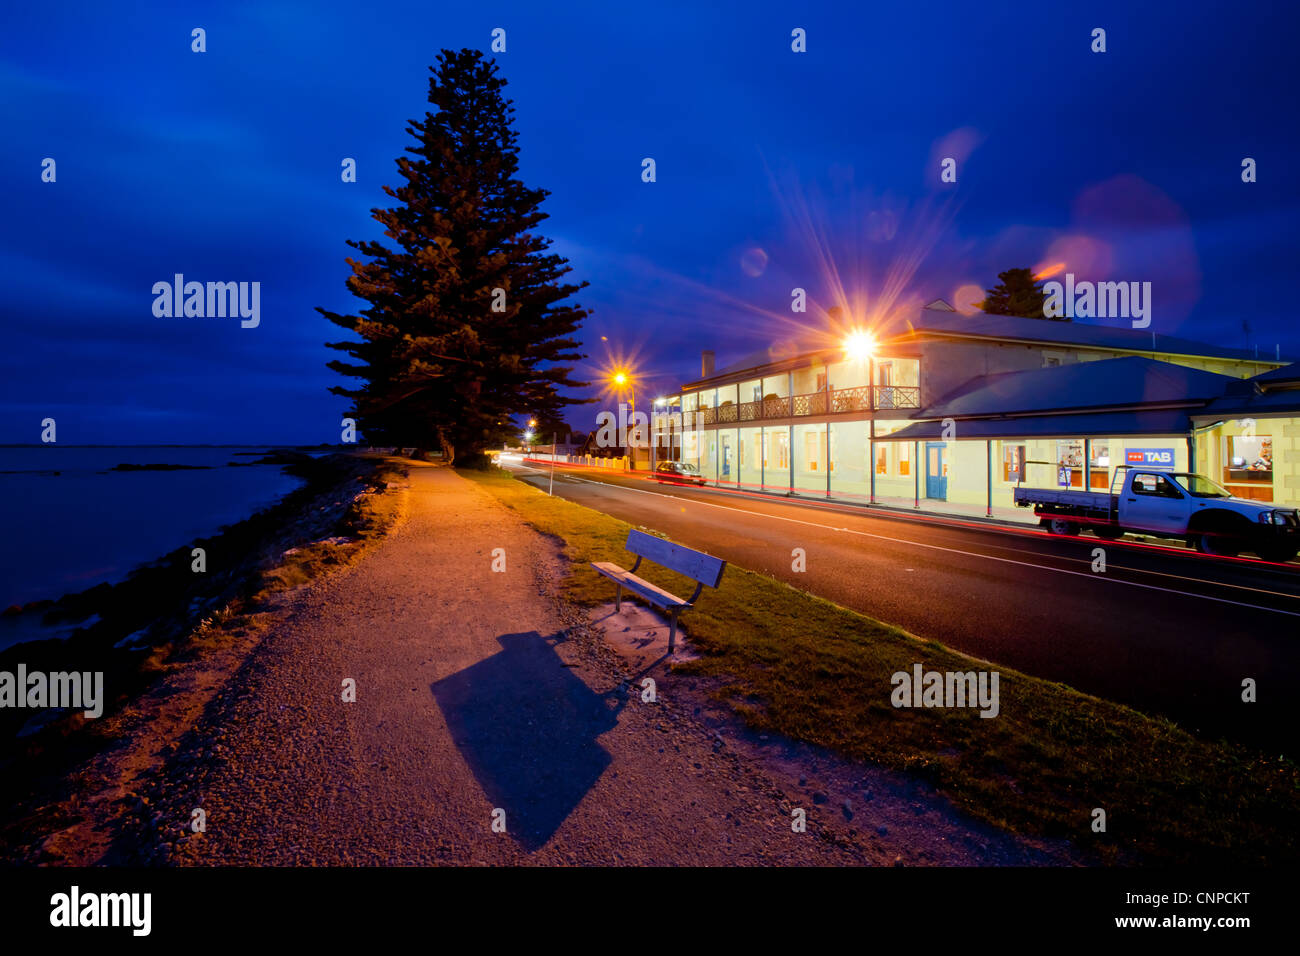 Robe at dusk. Limestone Coast. South East. South Australia. - Stock Image